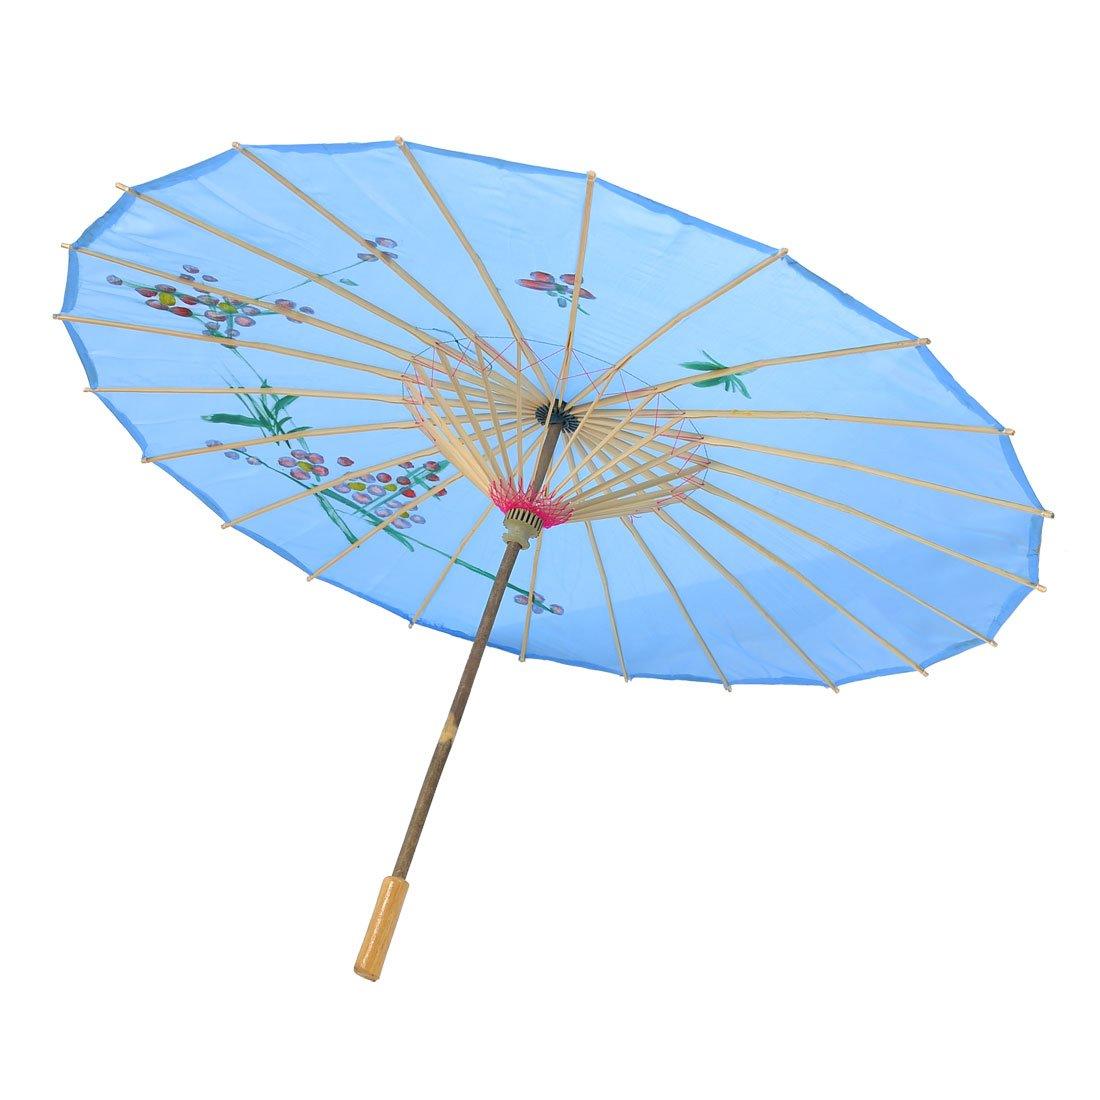 Amazon.com: uxcell Plum Blossom Pattern Bamboo Chinese Dance Parasol Umbrella Maya Blue: Garden & Outdoor